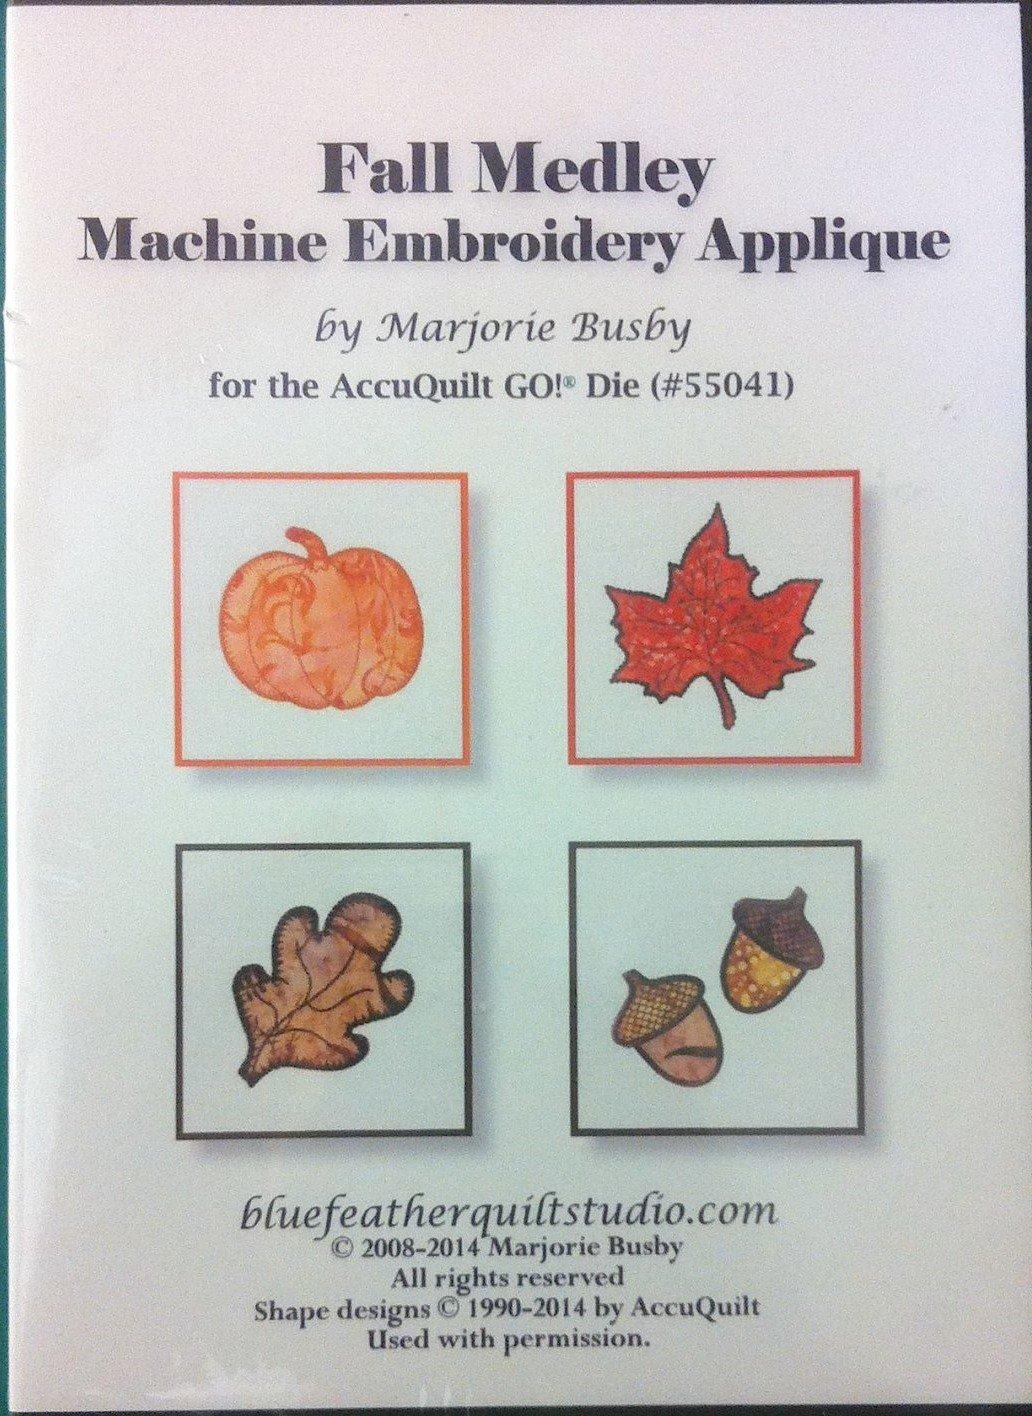 FALL MEDLEY APPLIQUE FOR ACCUQUILT 55041